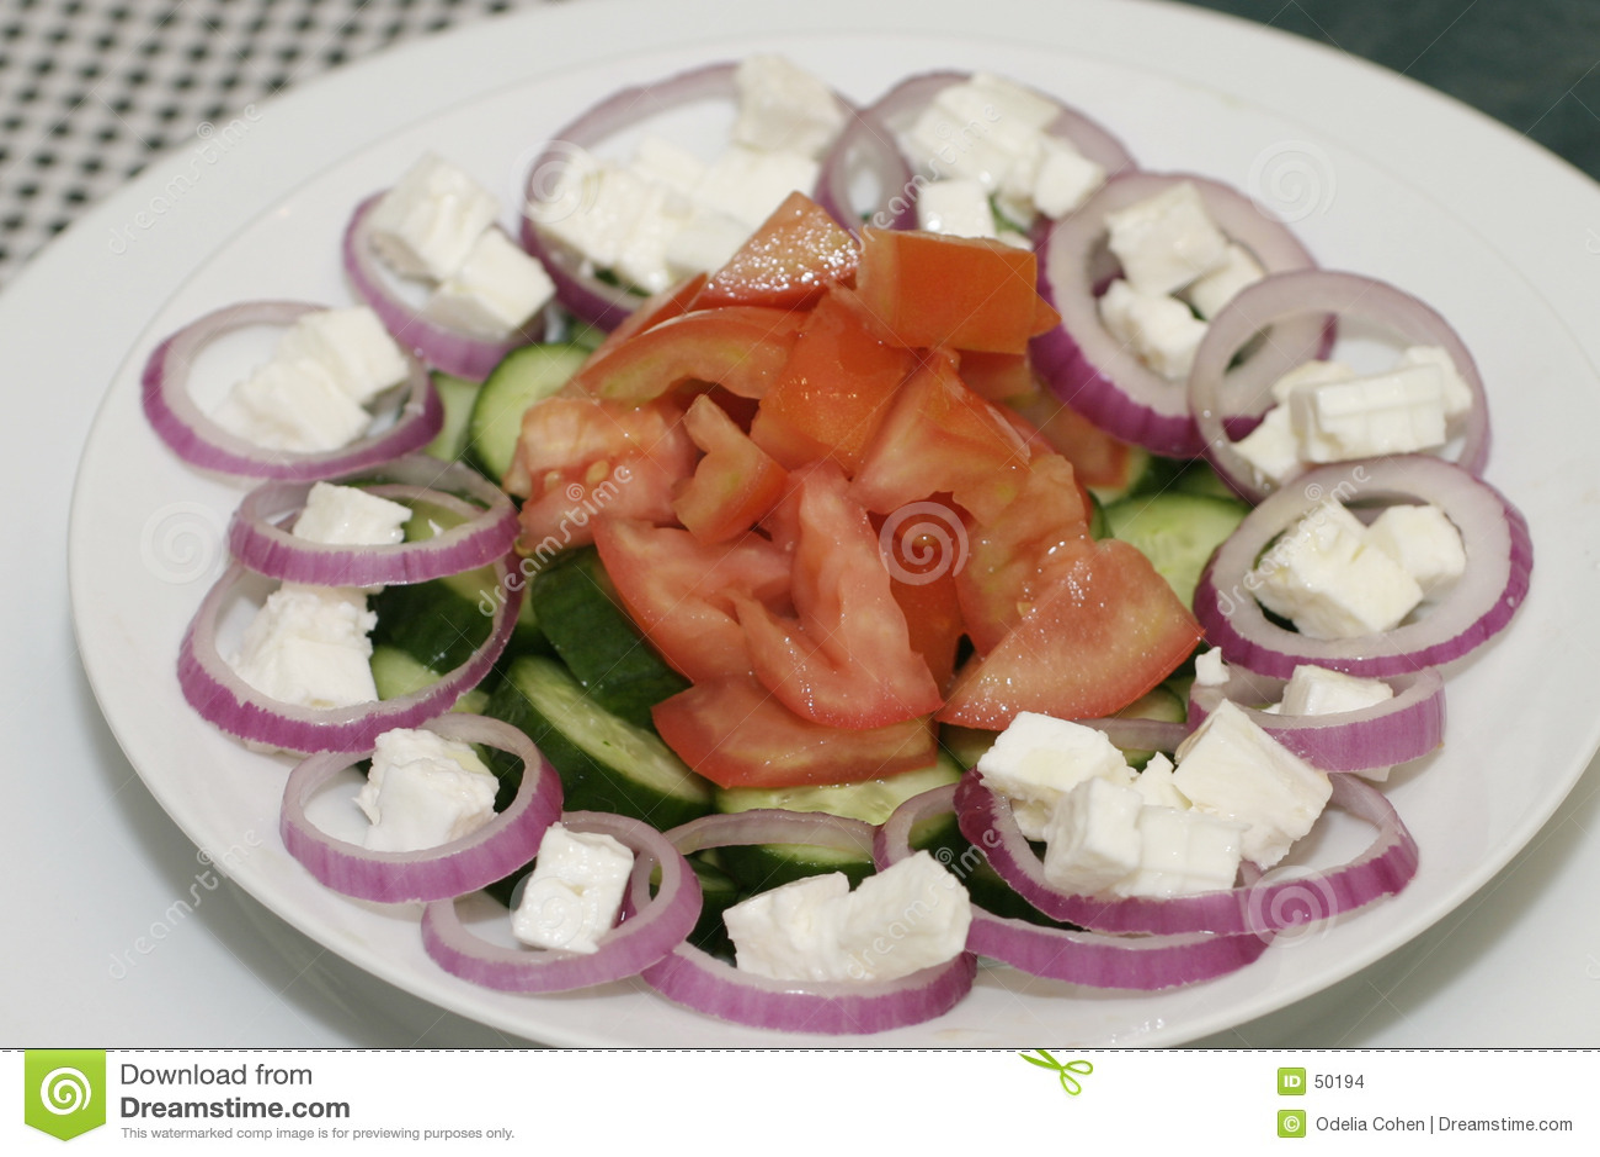 Download ελληνική σαλάτα στοκ εικόνες. εικόνα από ελλάδα, ζωηρόχρωμος - 50194